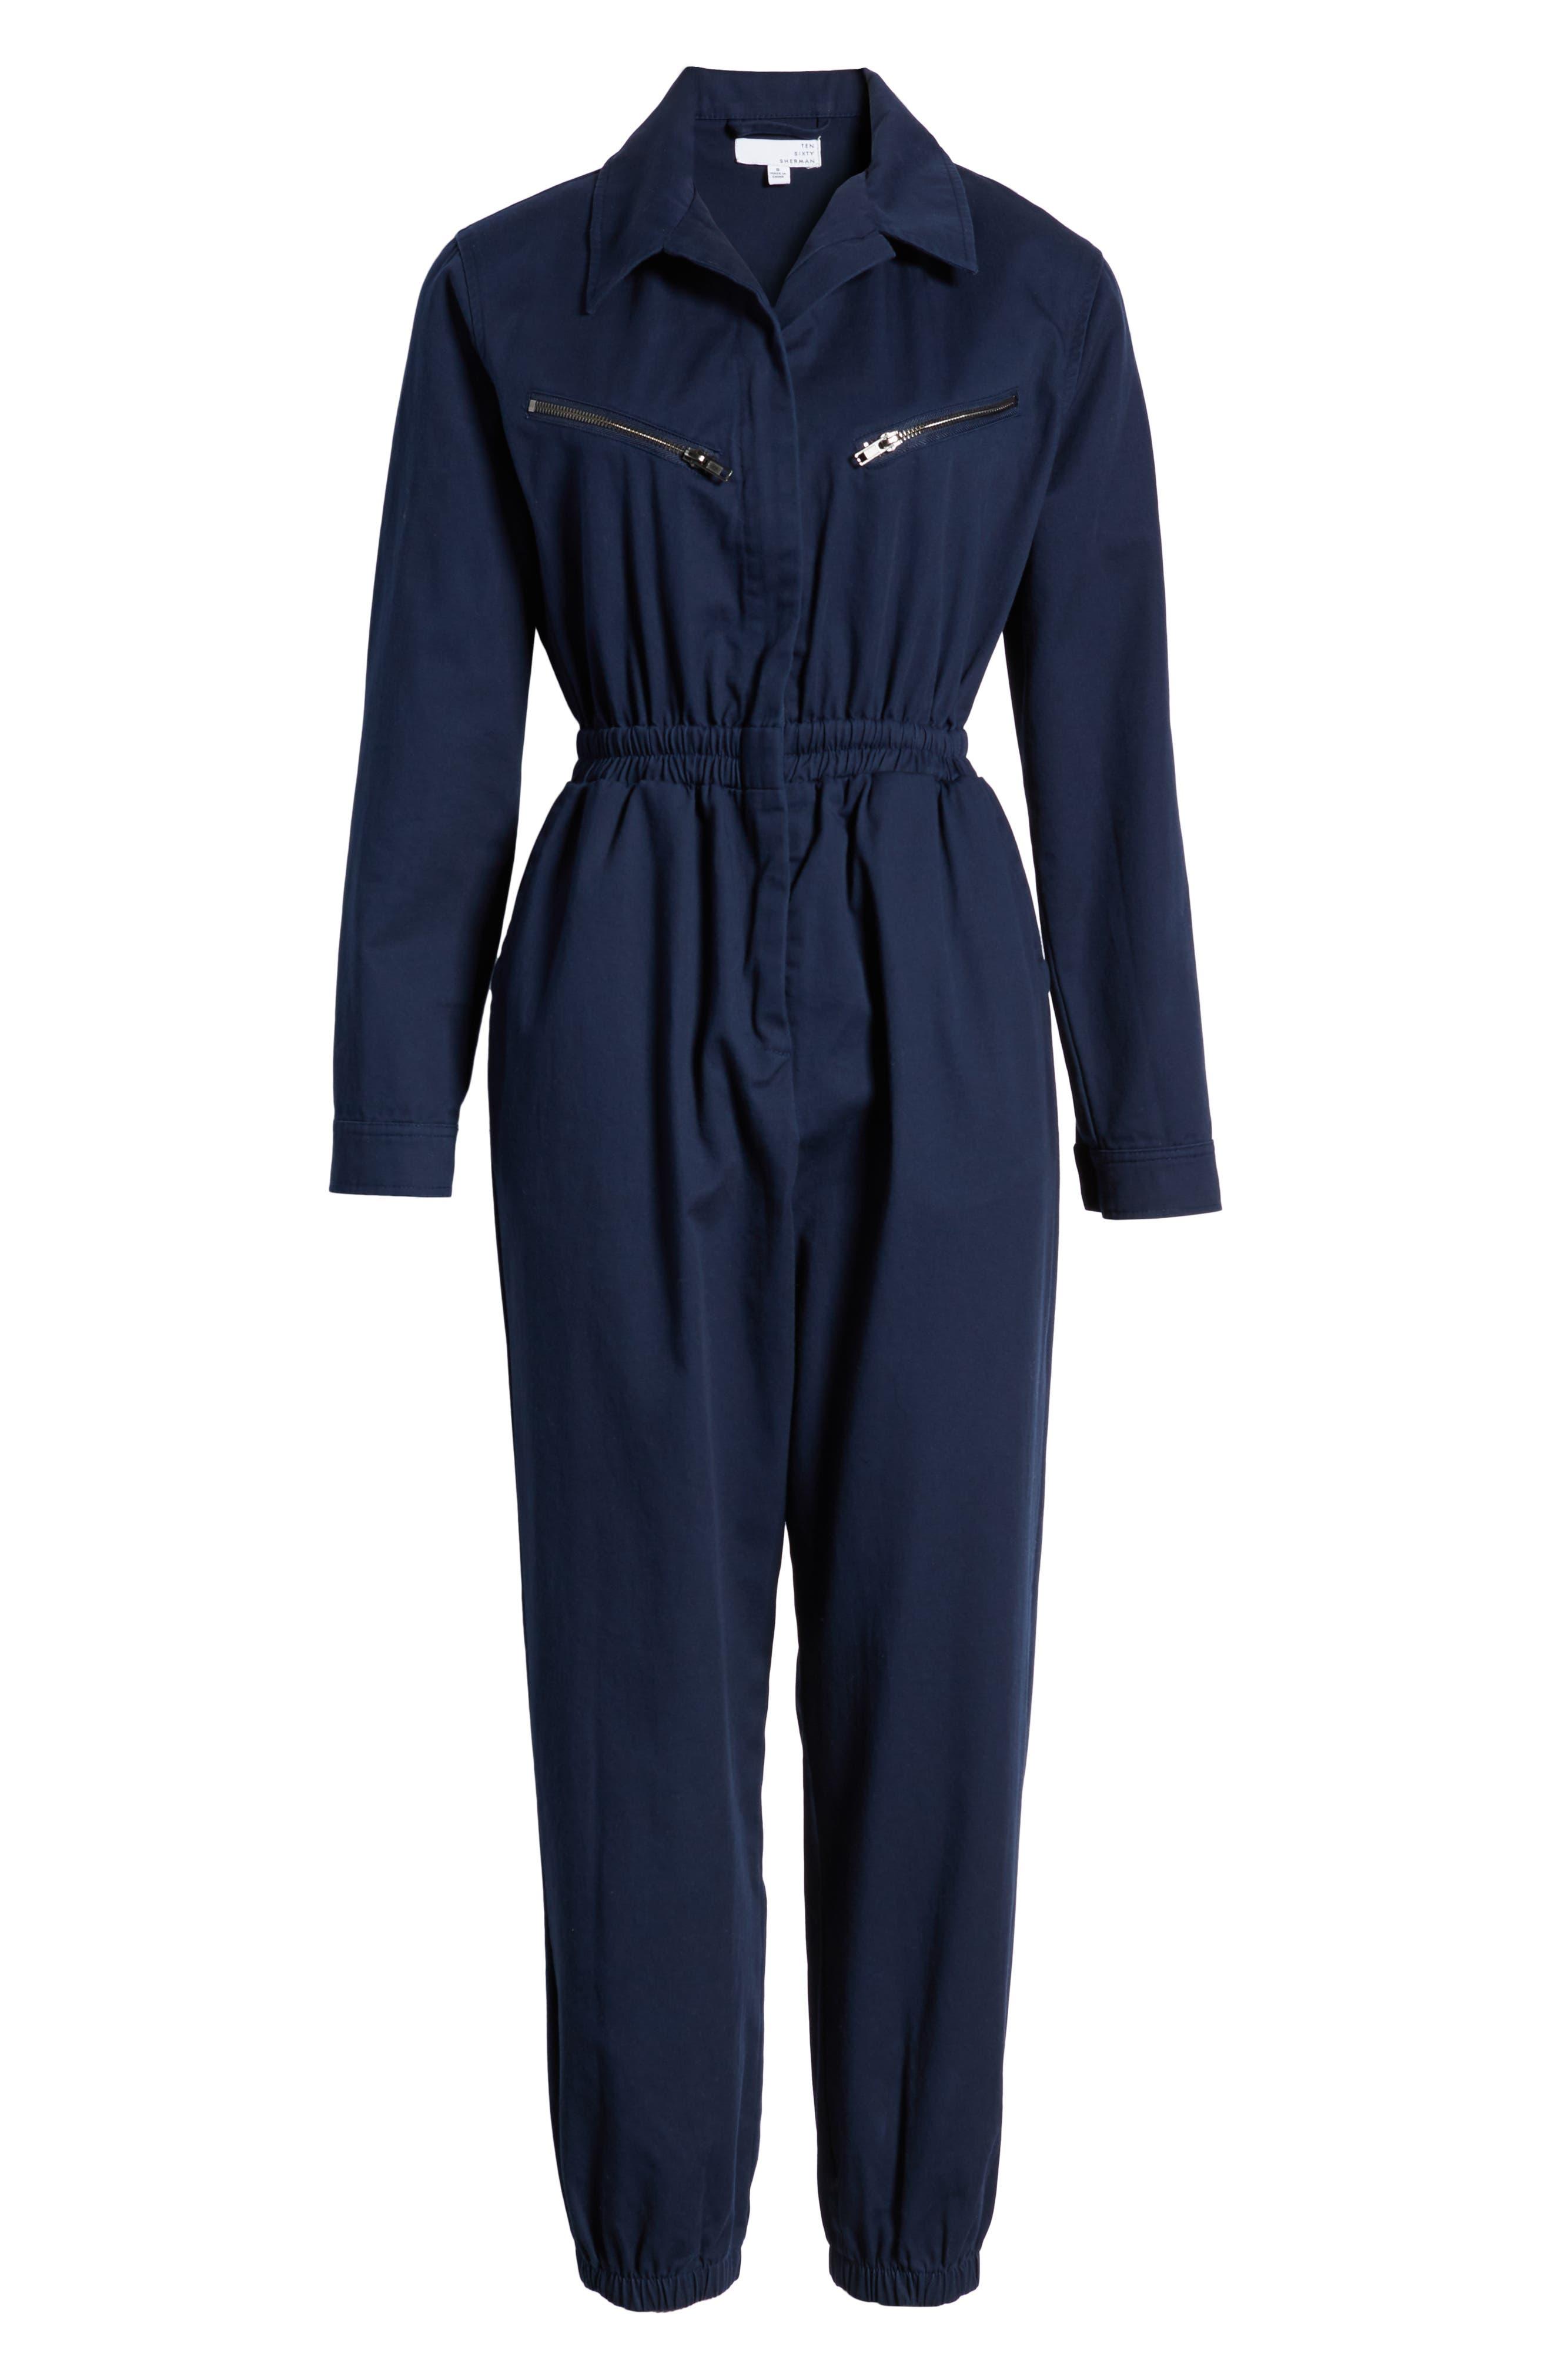 TEN SIXTY SHERMAN, Twill Workwear Jumpsuit, Alternate thumbnail 7, color, 400